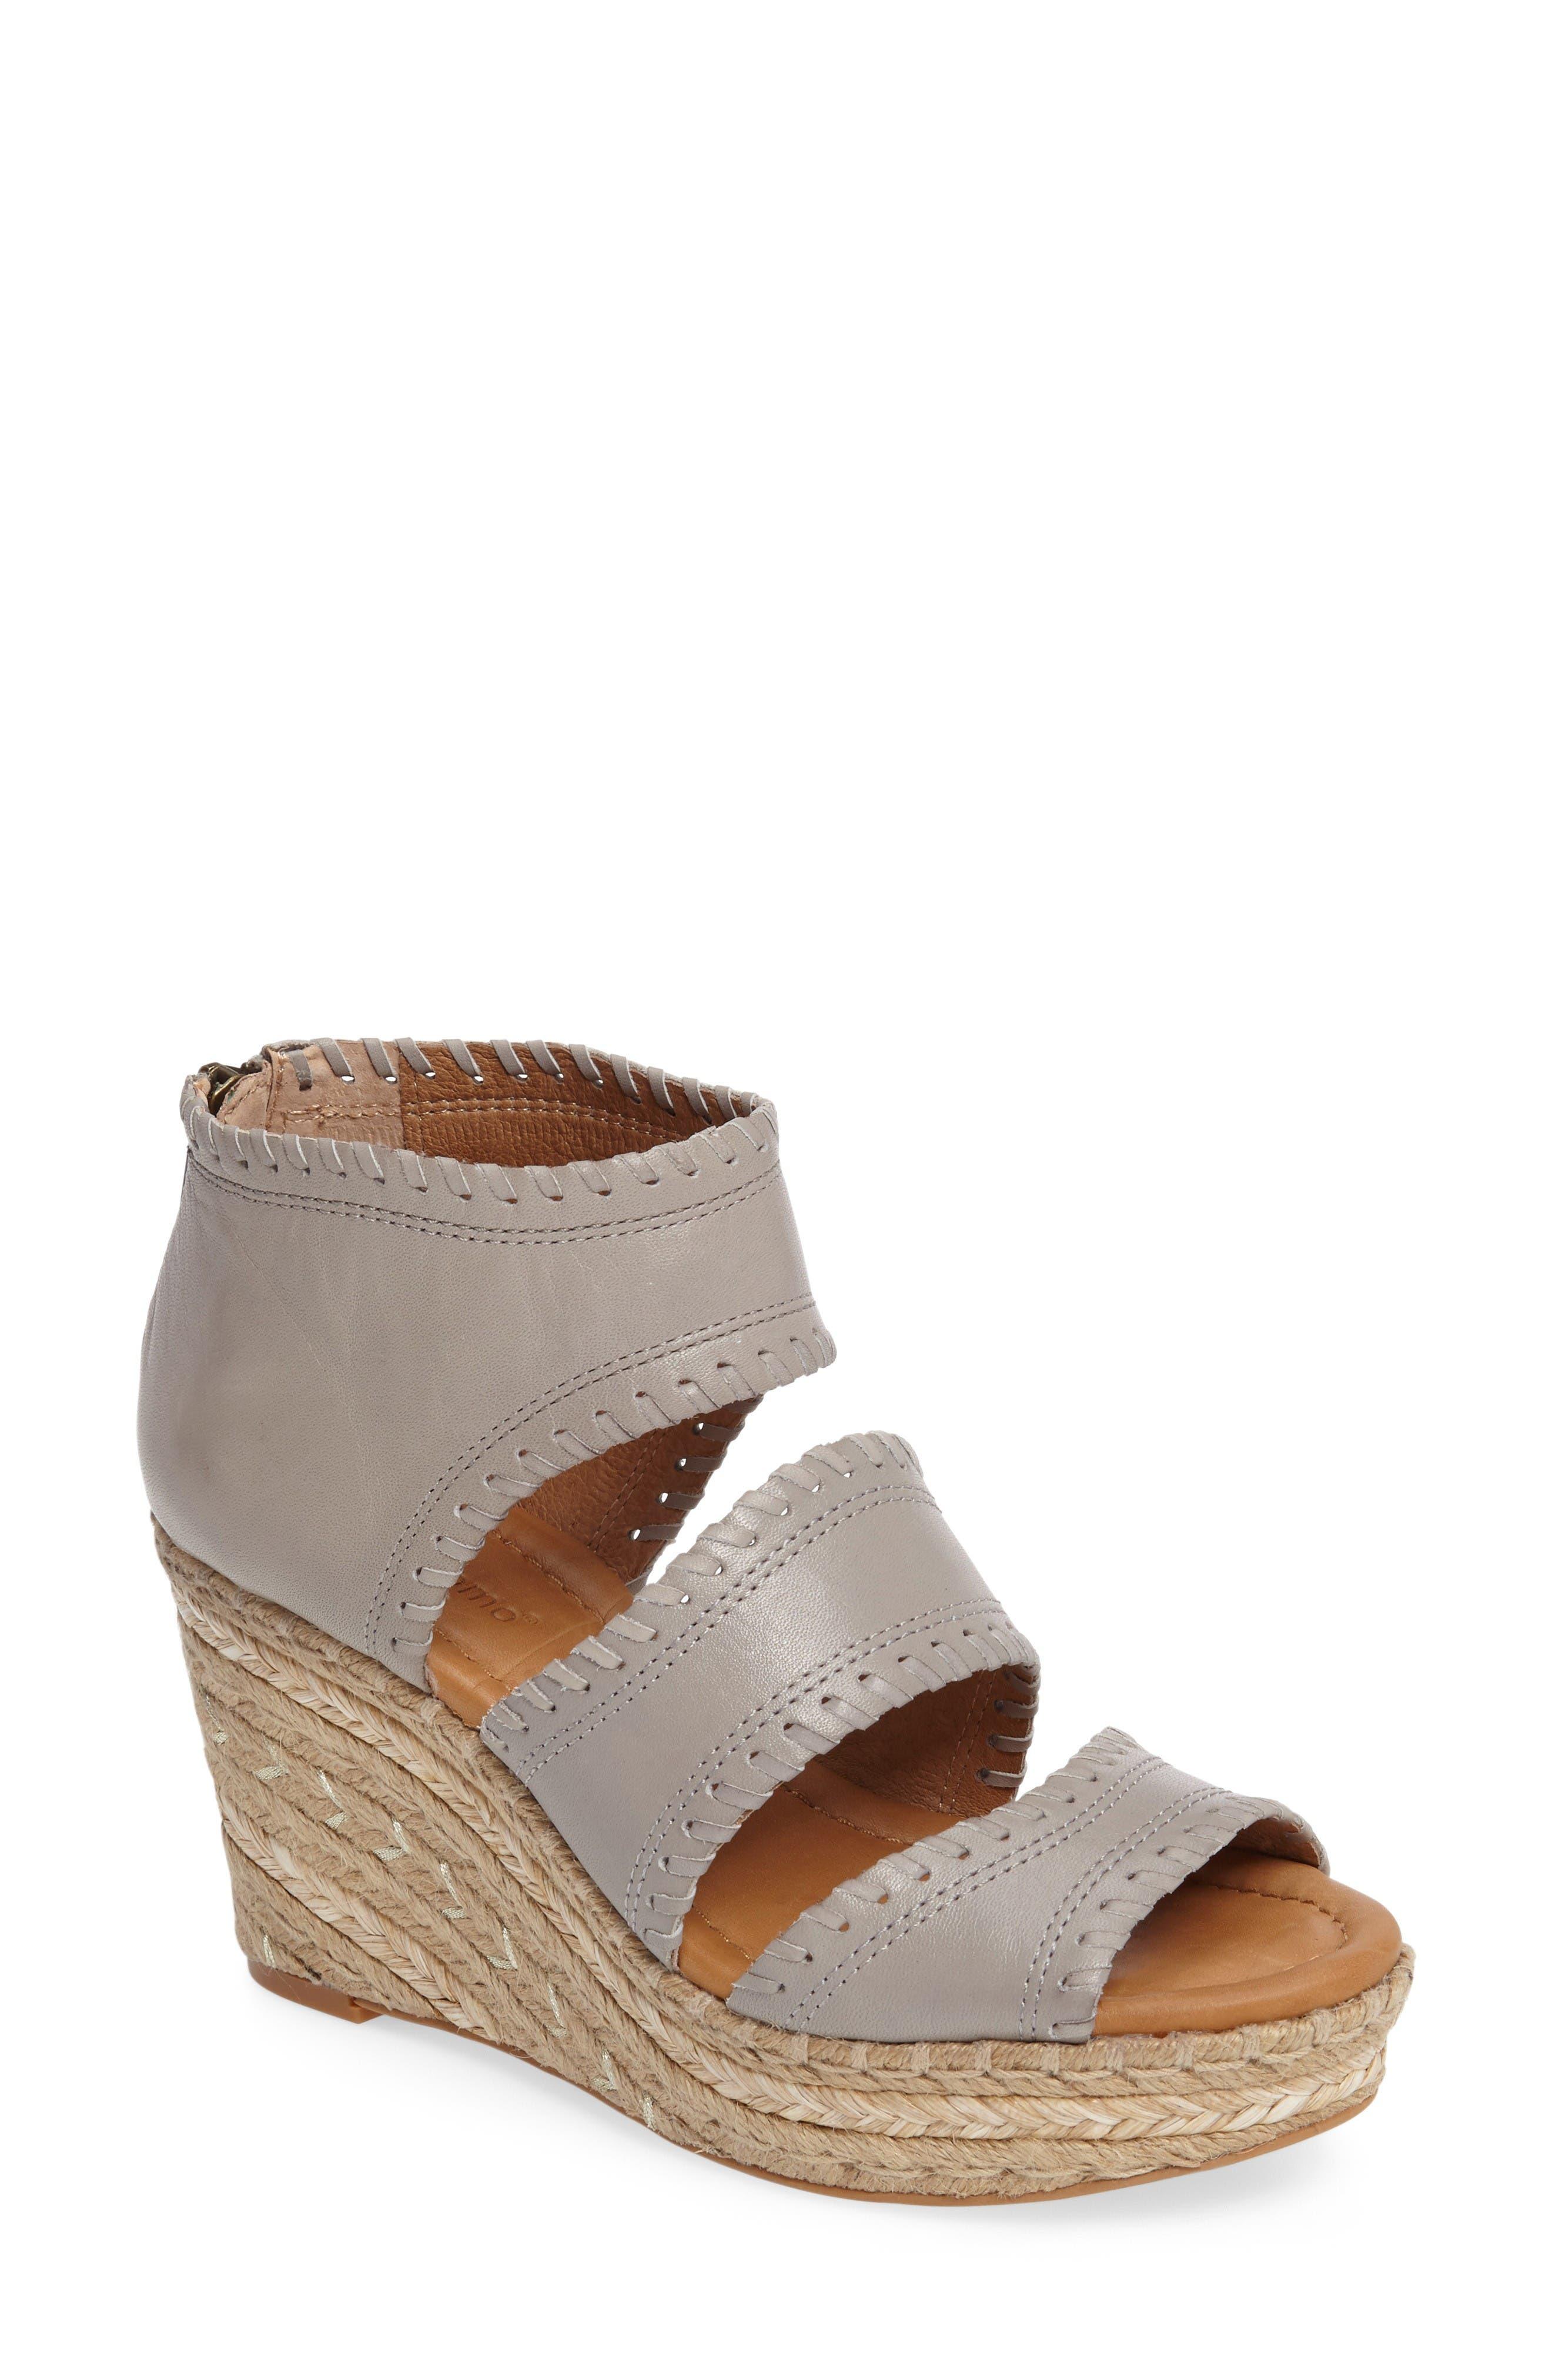 Main Image - Corso Como Joyce Wedge Sandal (Women)